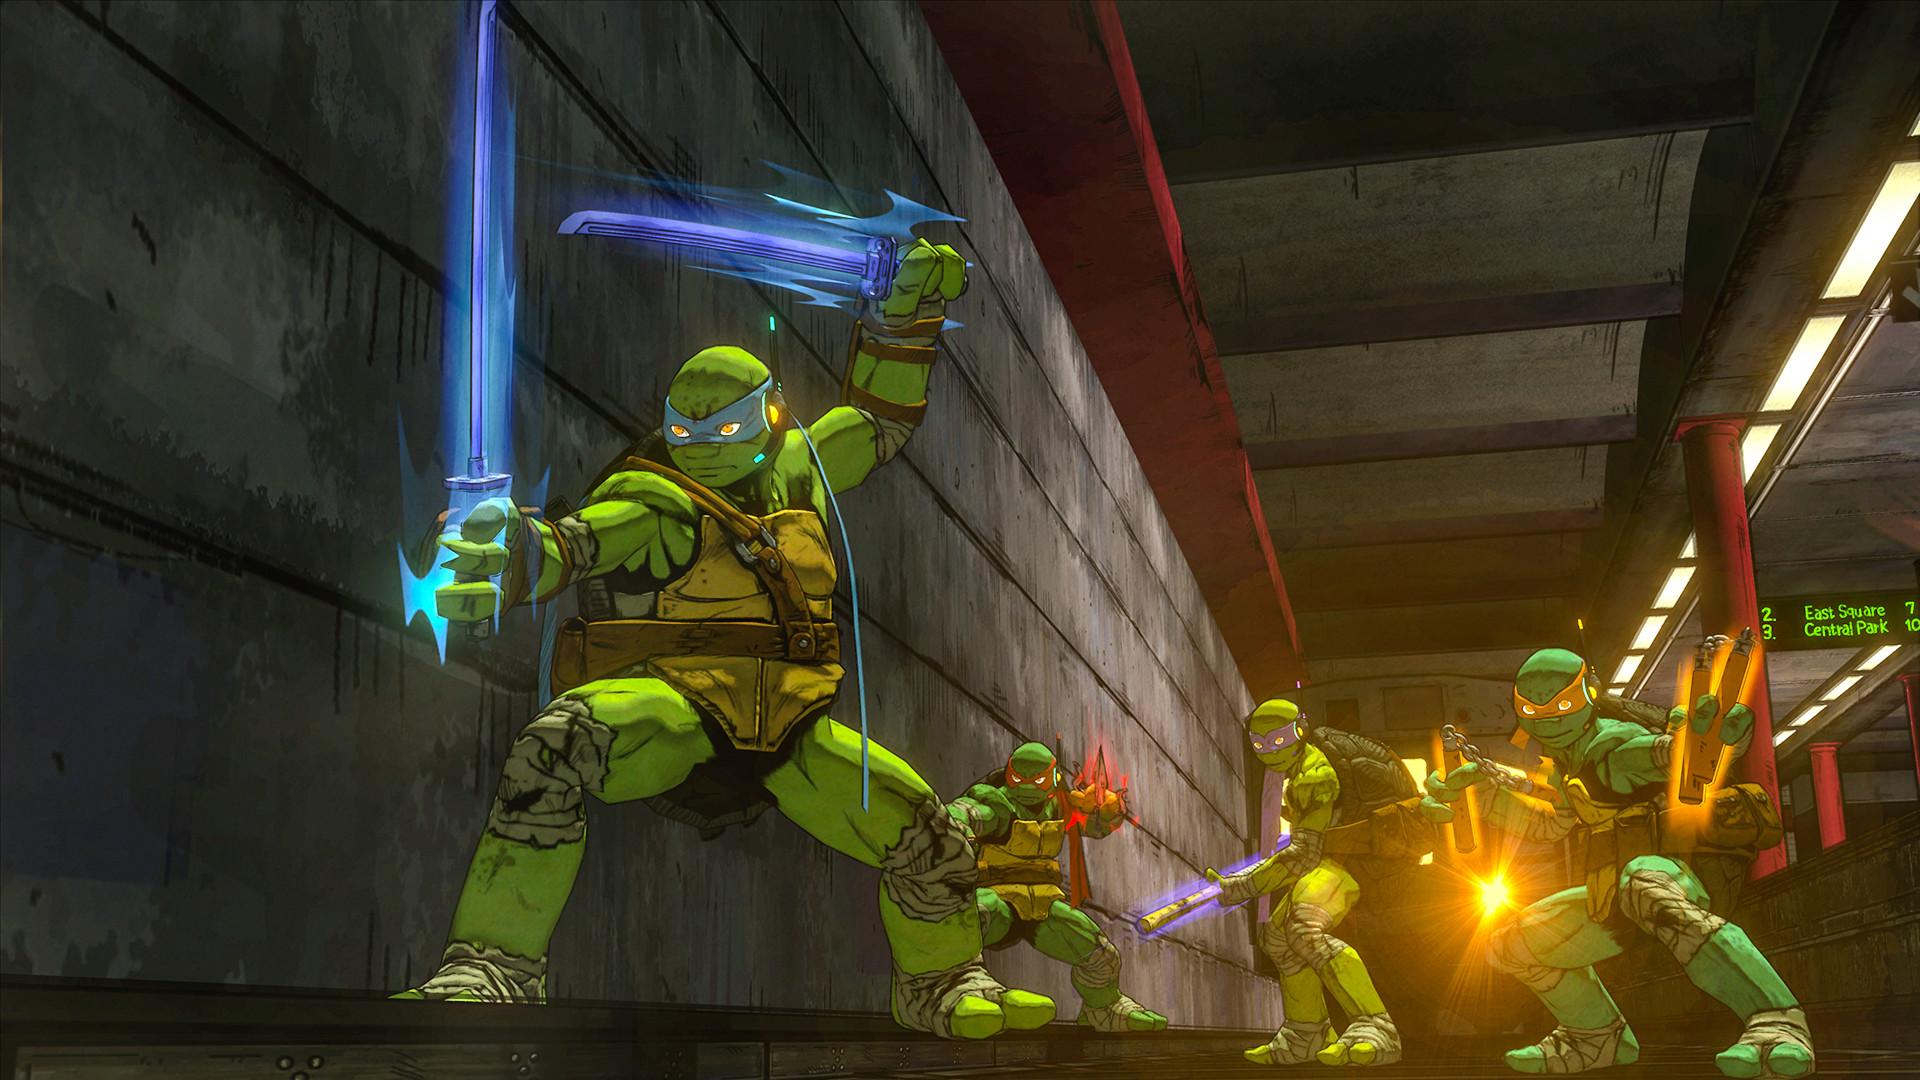 Teenage Mutant Ninja Turtles Mutants In Manhattan ESPAÑOL PC Full (CODEX) + REPACK 2 DVD5 (JPW) 2